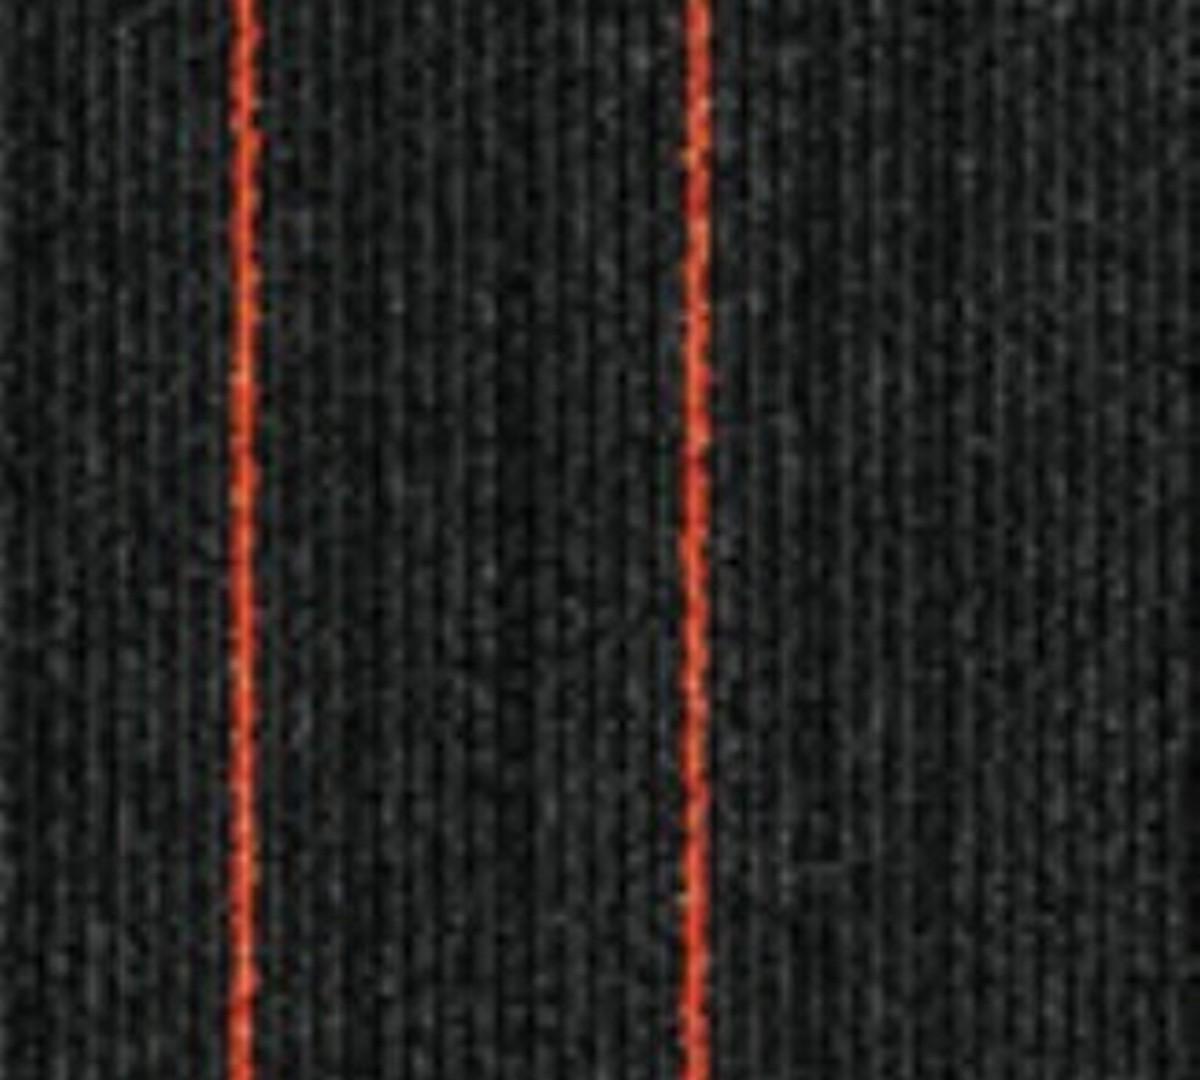 Ковровая плитка DESSO AirMaster 4407 (500*500*6 мм)